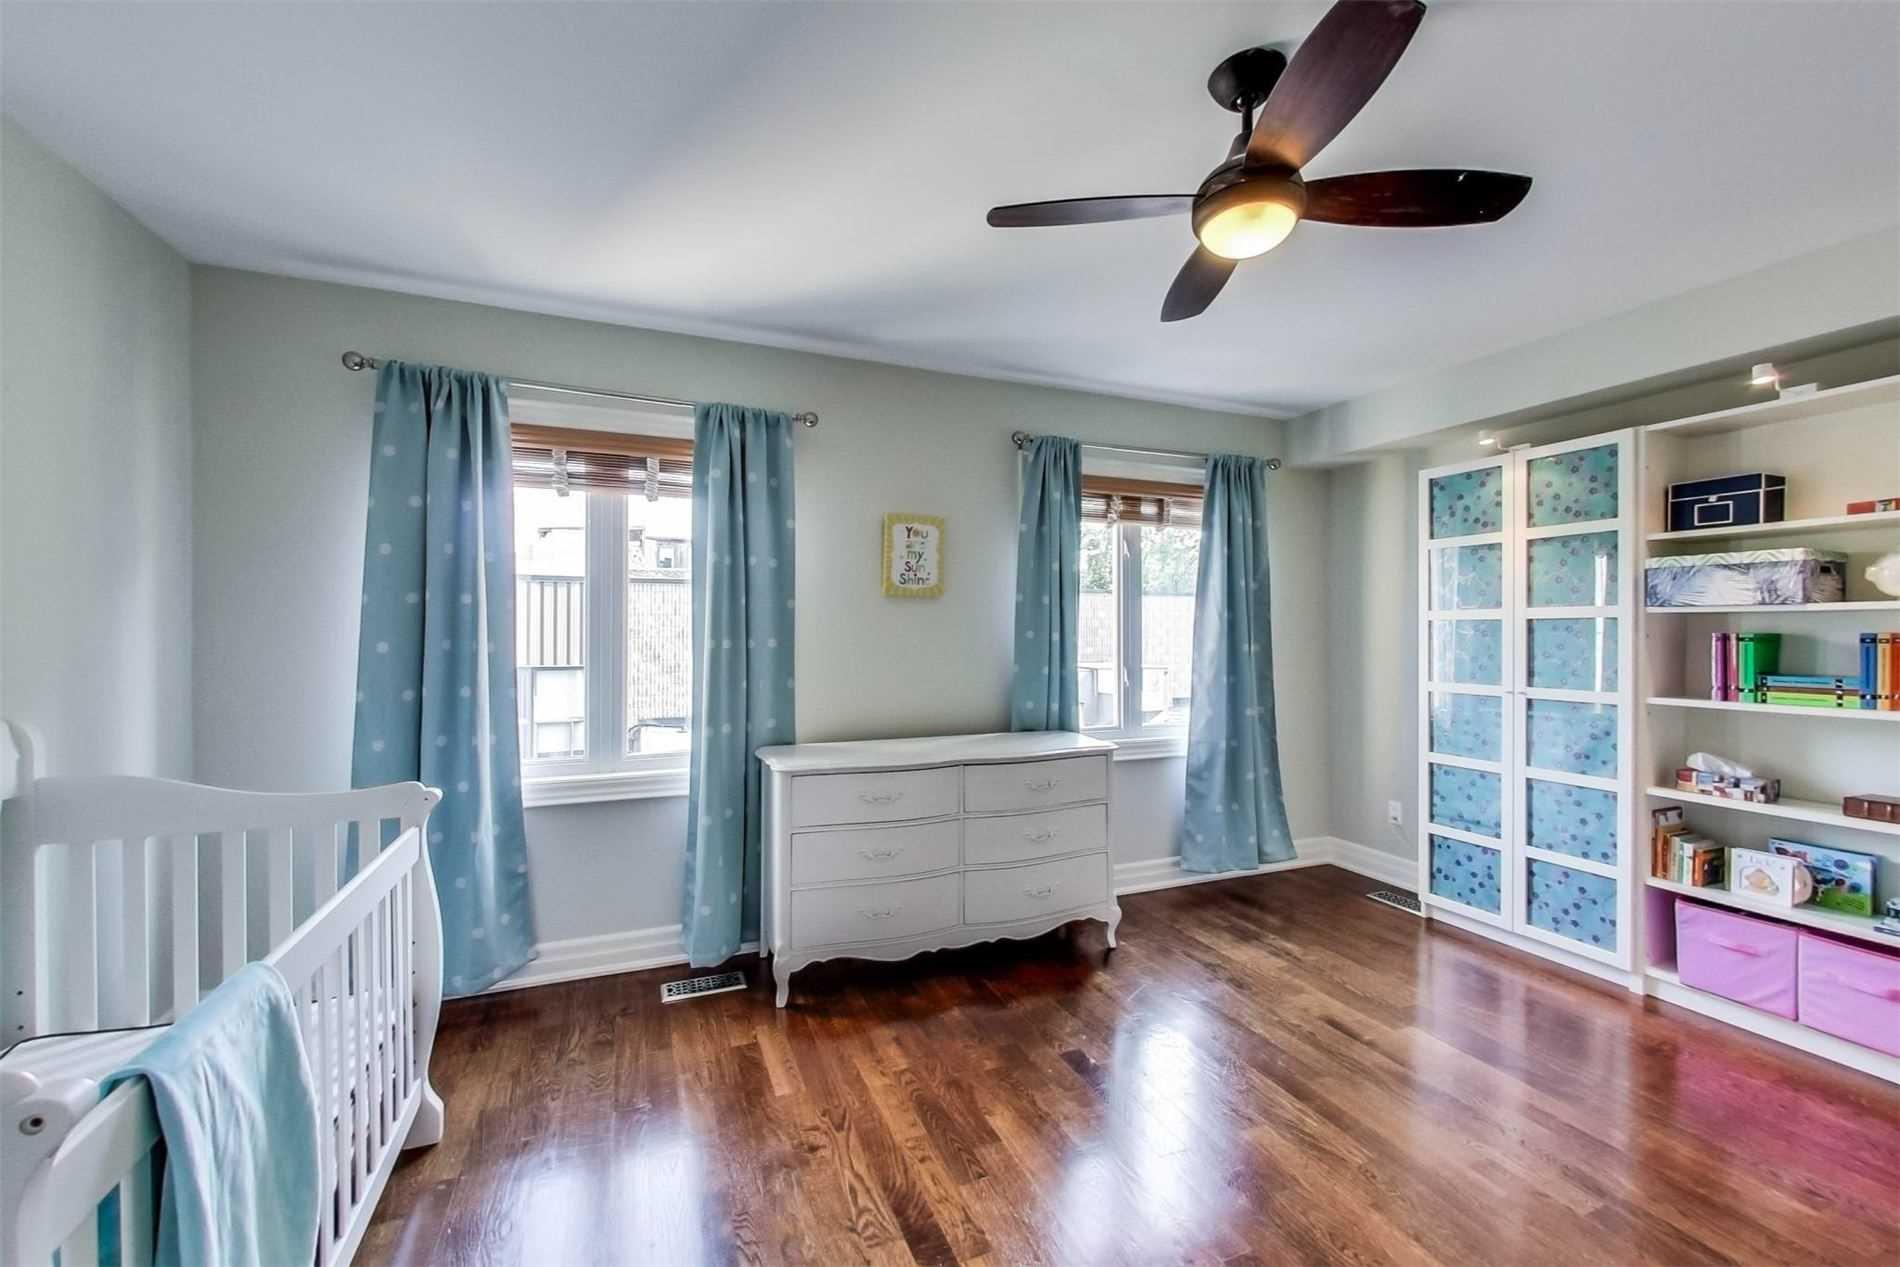 Photo 18: Photos: 213 Heward Avenue in Toronto: South Riverdale House (3-Storey) for sale (Toronto E01)  : MLS®# E4941877